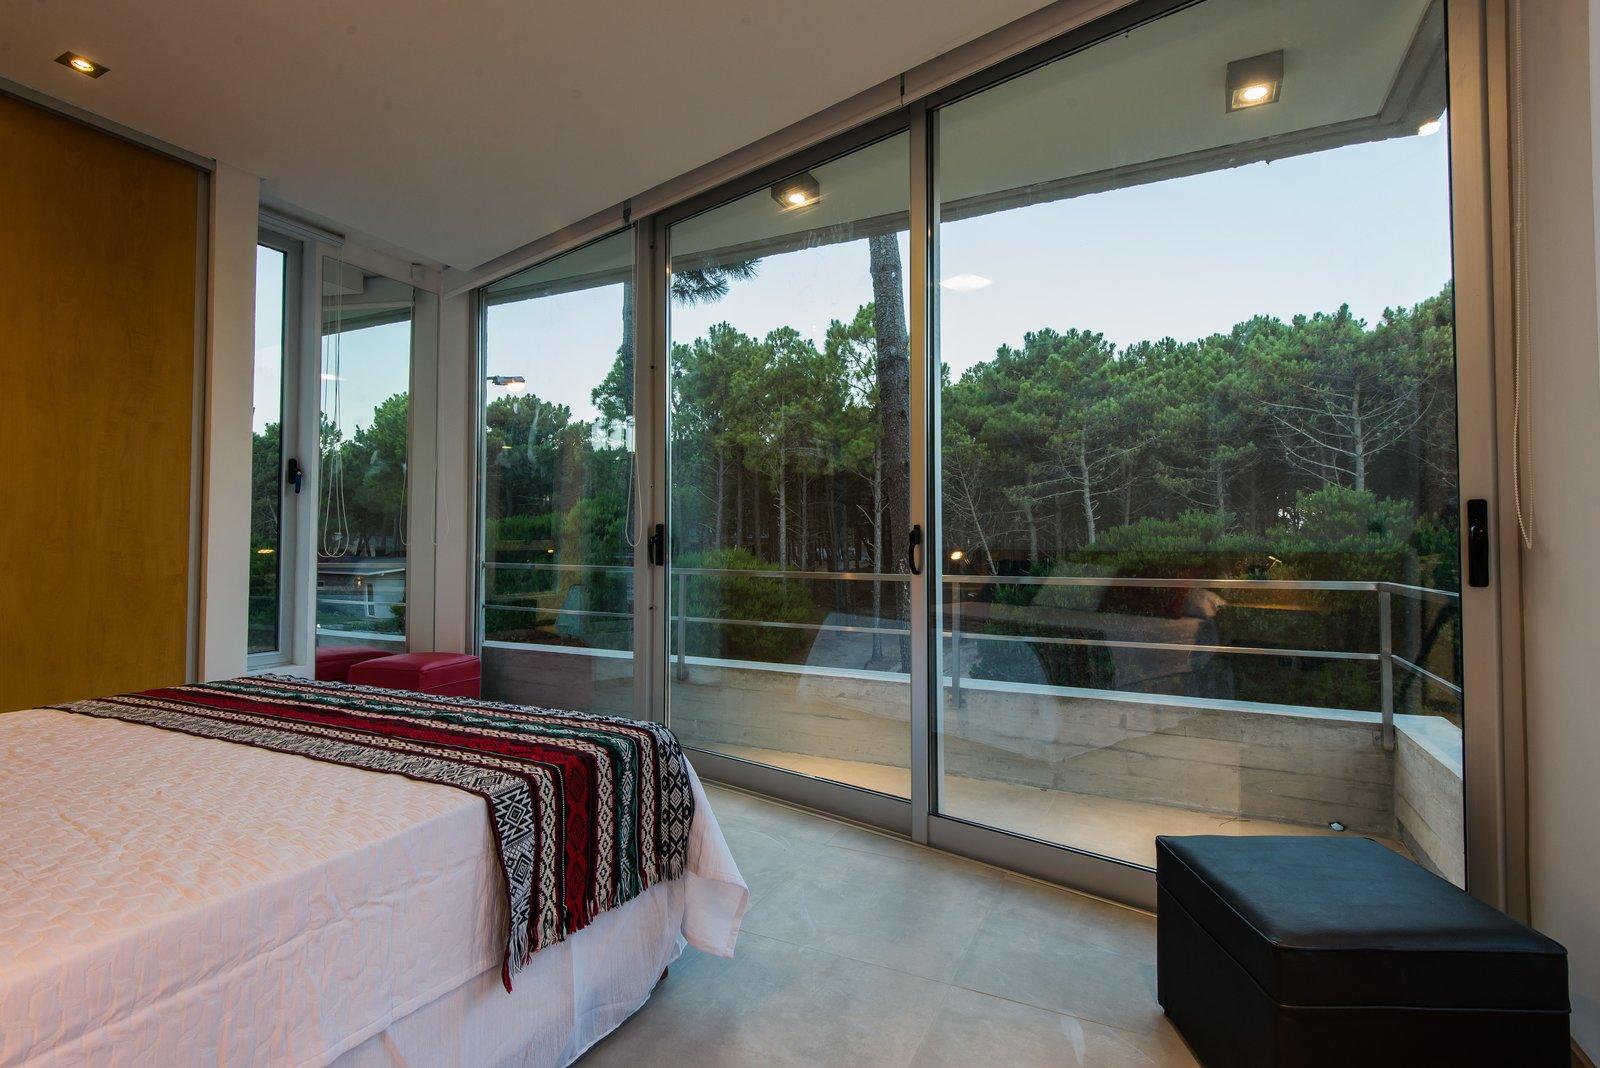 Tagged: Bedroom, Bed, Storage, Ceiling Lighting, and Porcelain Tile Floor.  Casa Batin by Estudio Galera